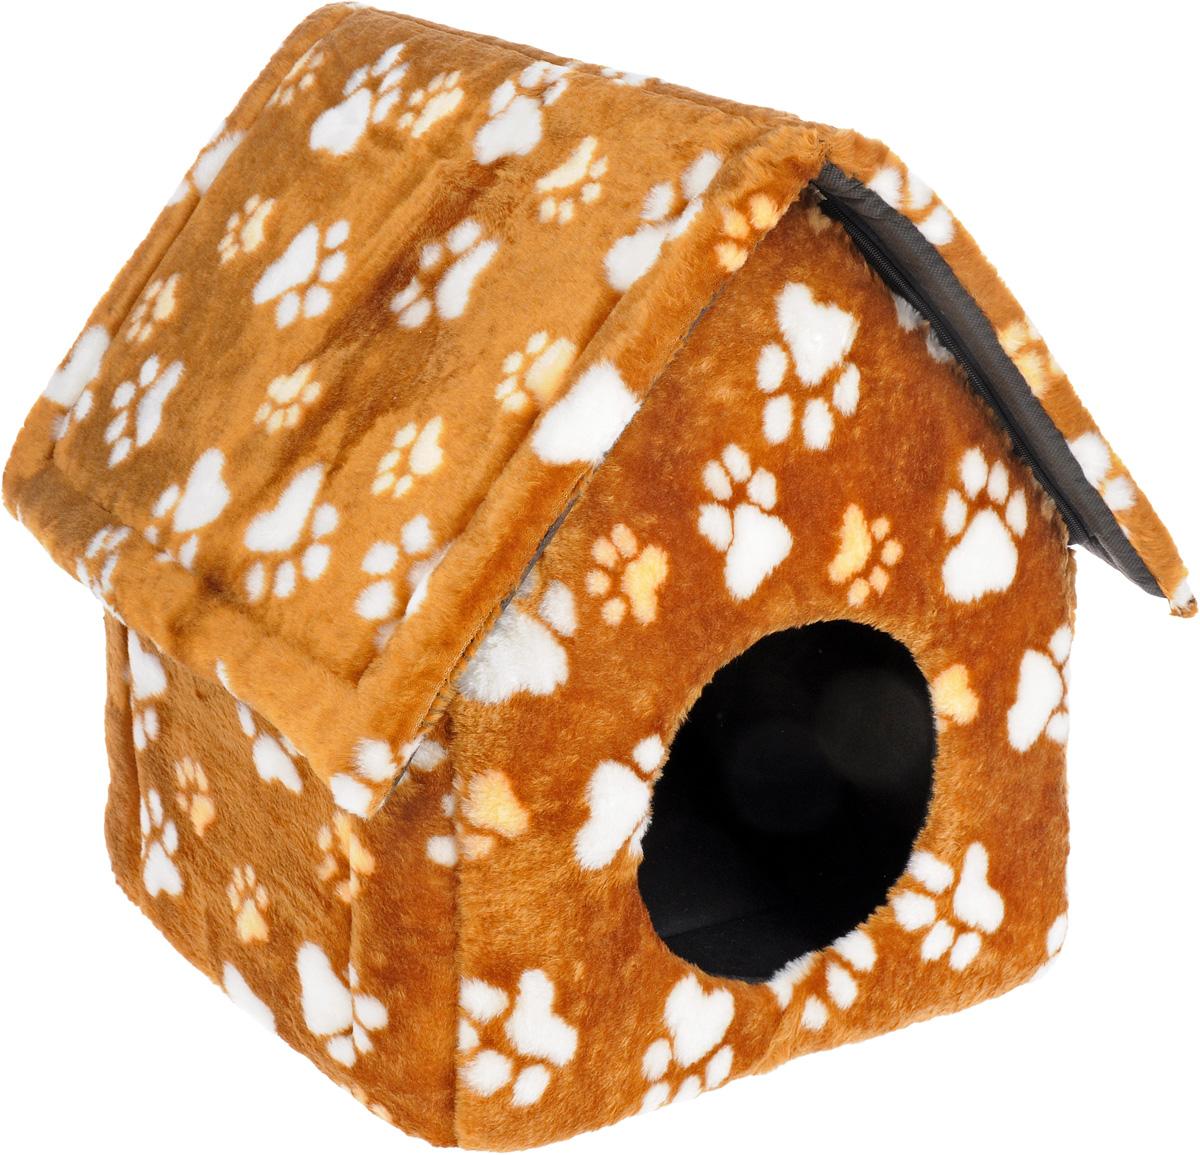 "Домик для животных ""Elite Valley"", цвет: светло-коричневый, белый, 37 х 35 х 45 см. Л-20/1"